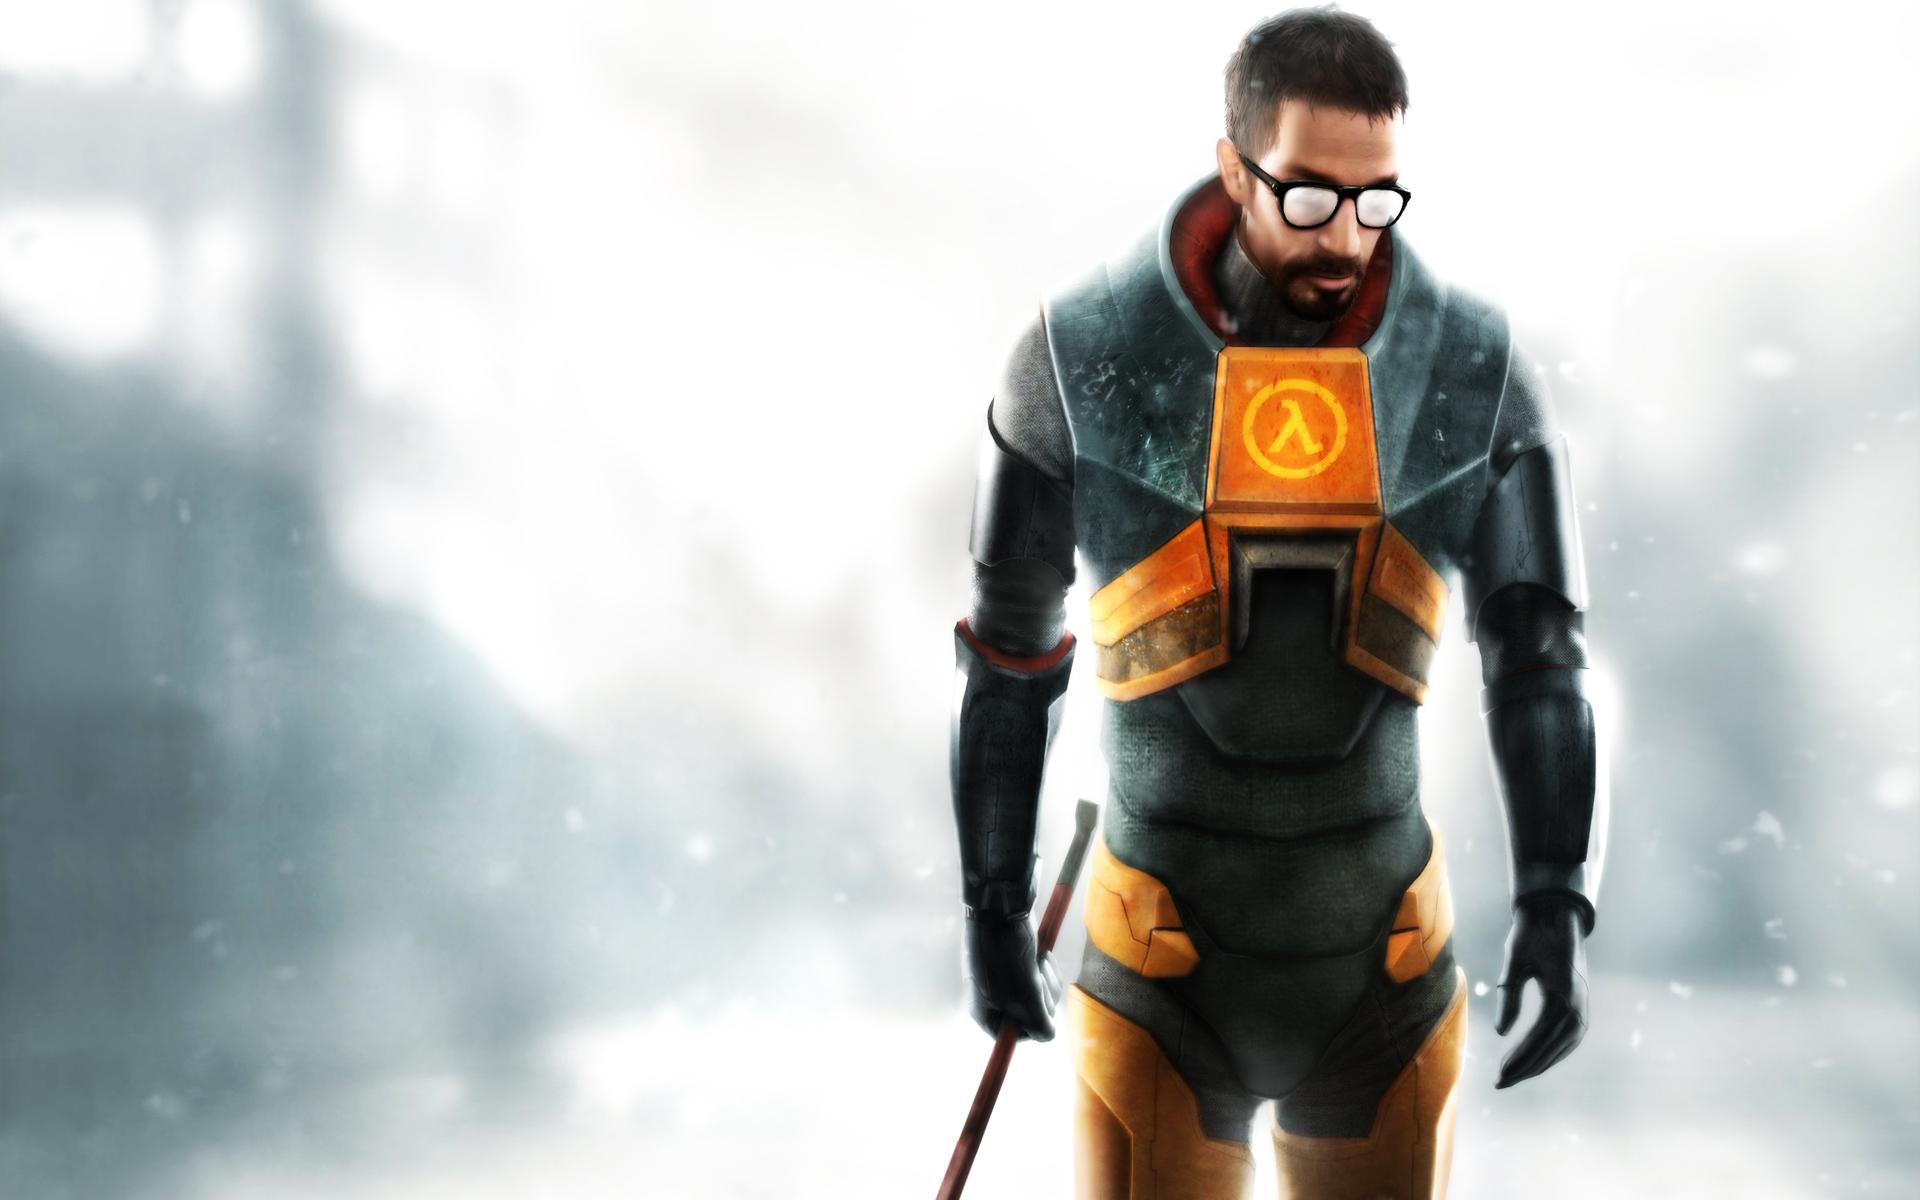 HD Wallpaper | Background ID:4330. 1920x1200 Video Game Half-life